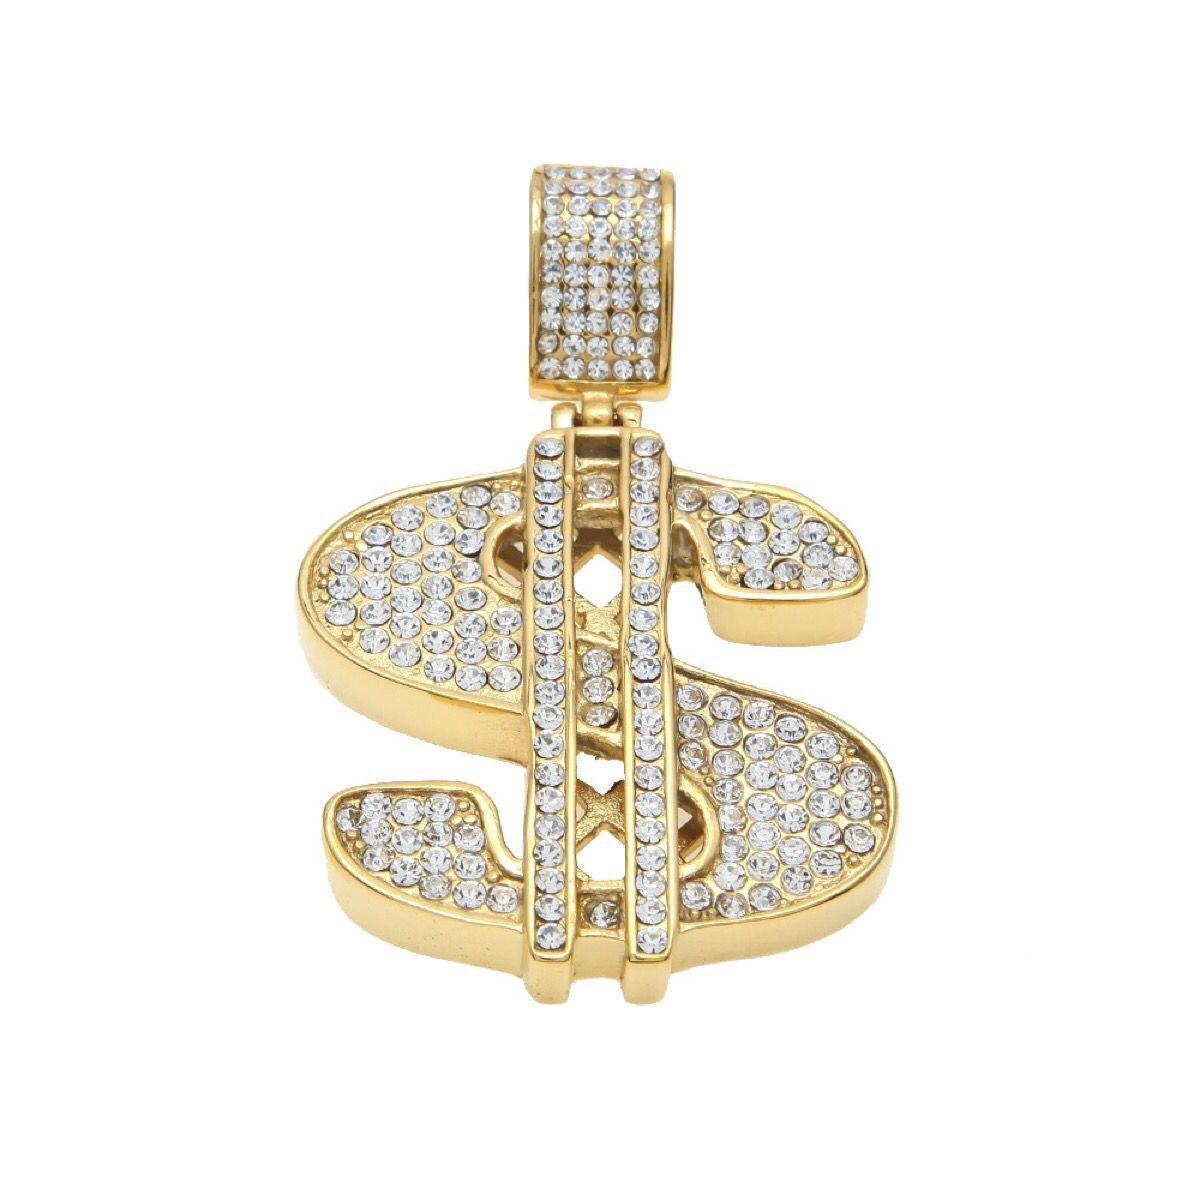 Gold Color $ Money Symbol Pendant Hip Hop Bling Crystal Dollar Sign 76cm Gold Link Chain Pendant Necklace Men Women Jewelry